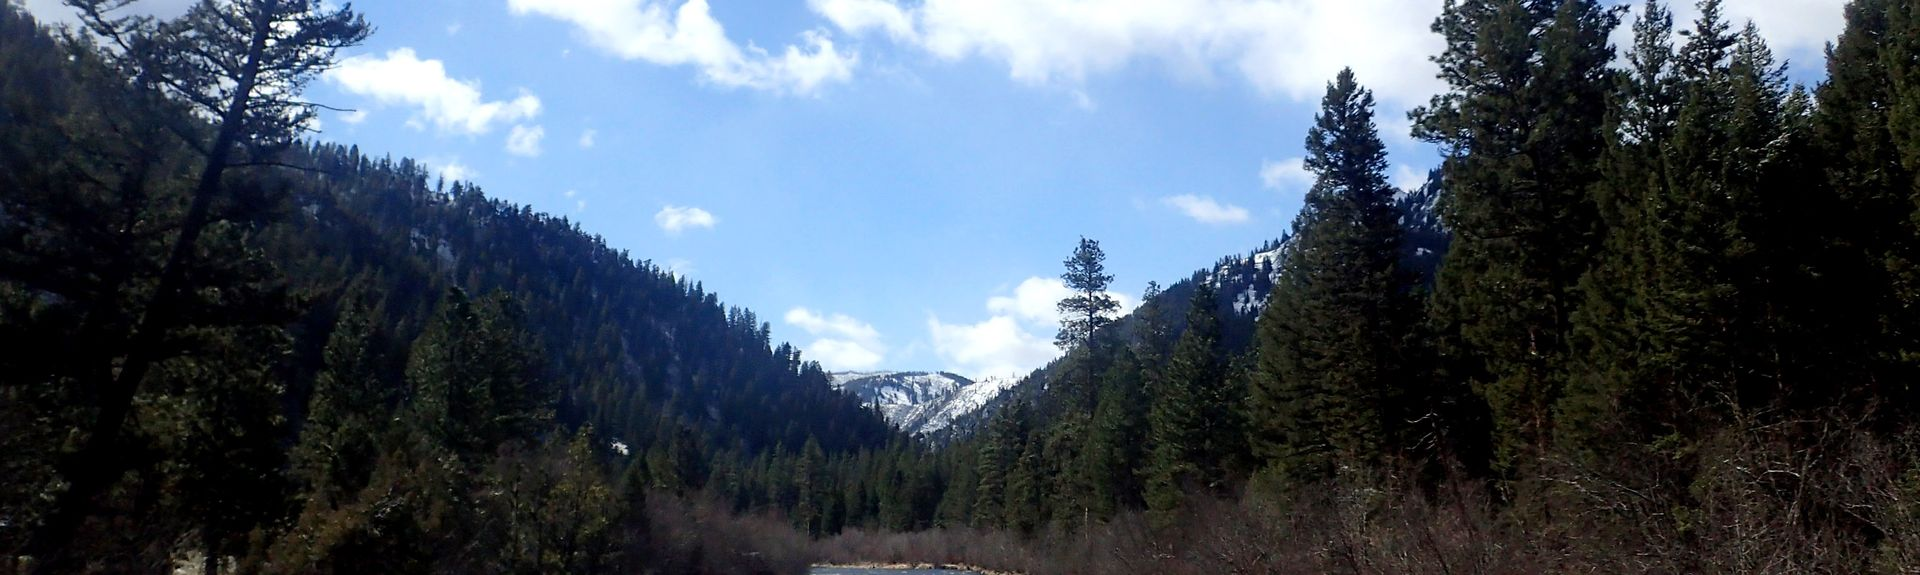 Corvallis, Montana, Verenigde Staten